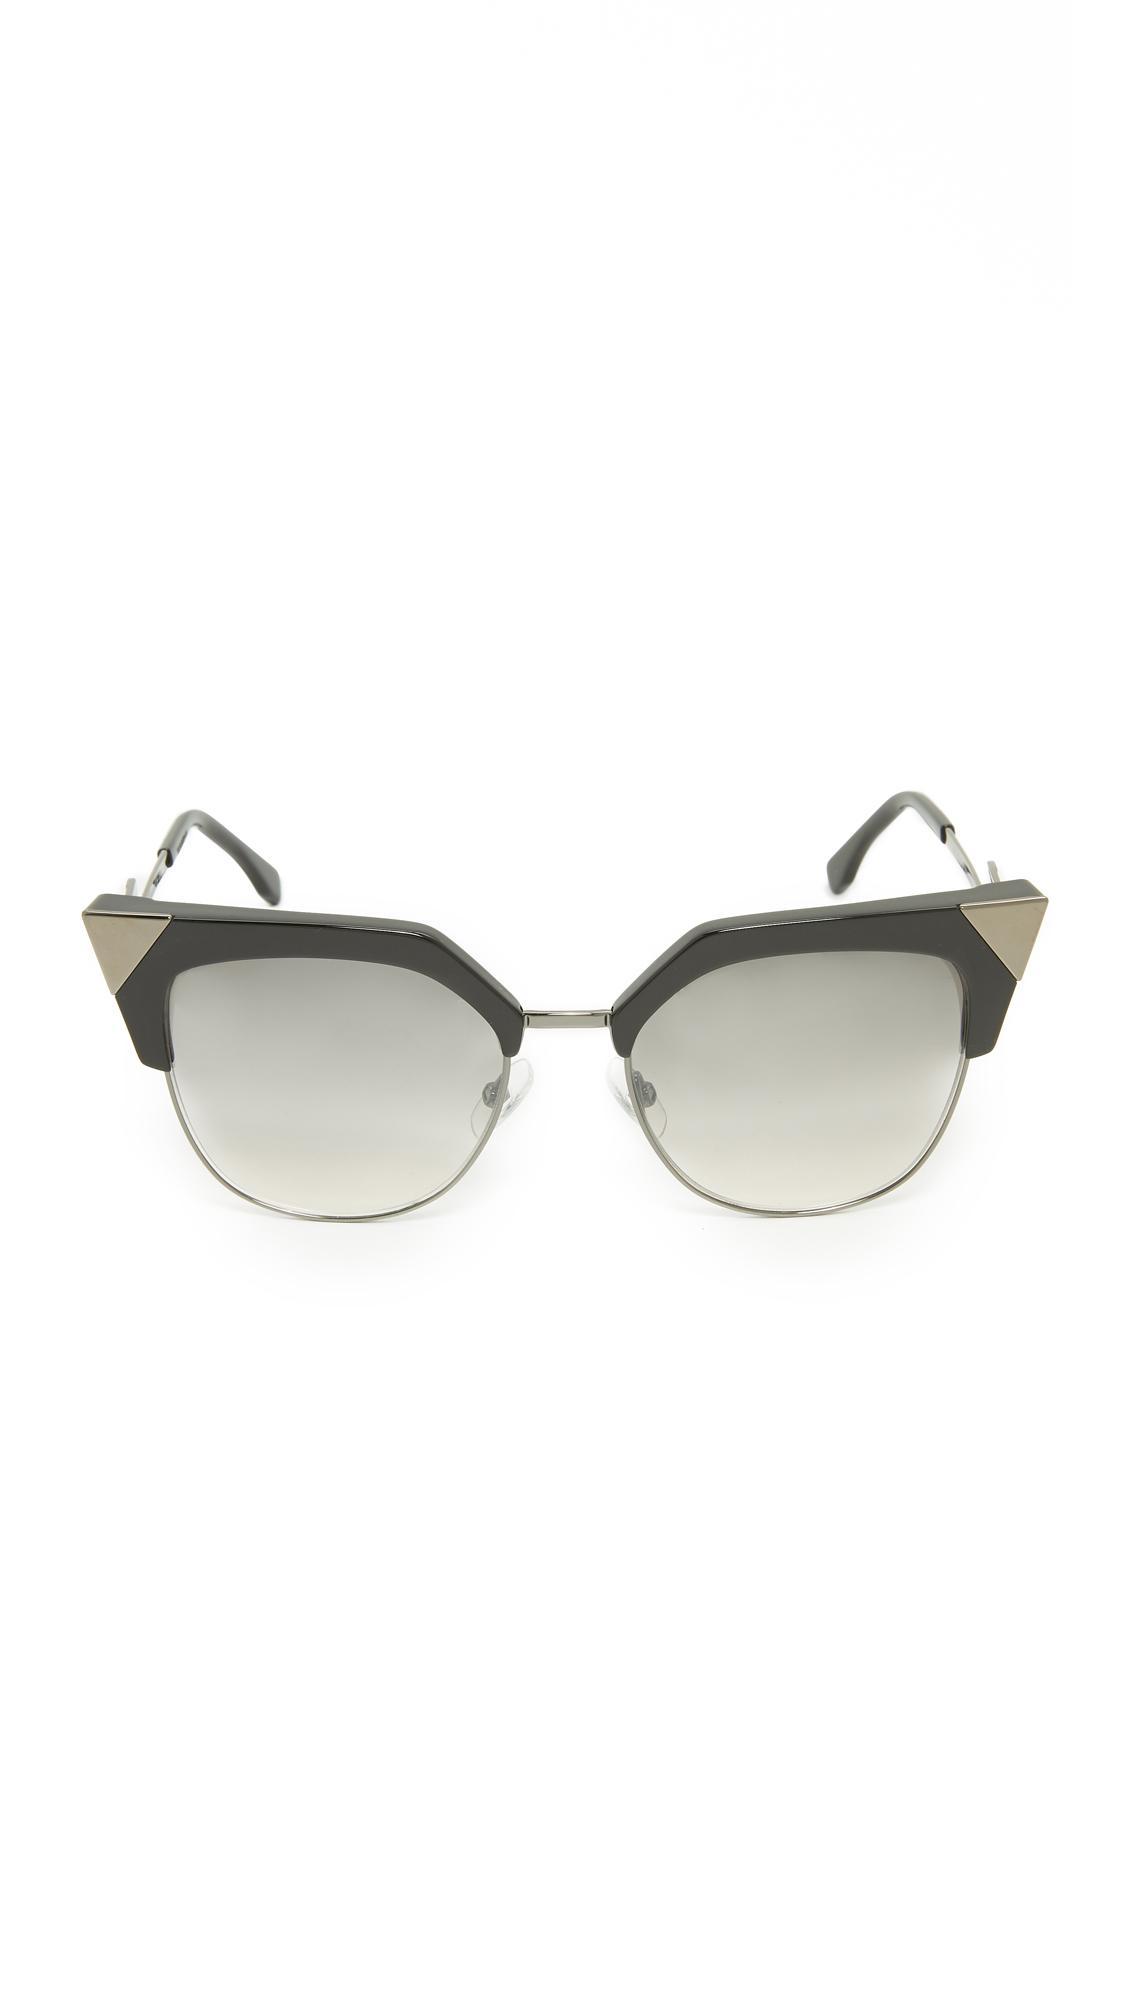 03dc8e9347b Fendi Iridia Crystal Corner Sunglasses in Gray - Lyst